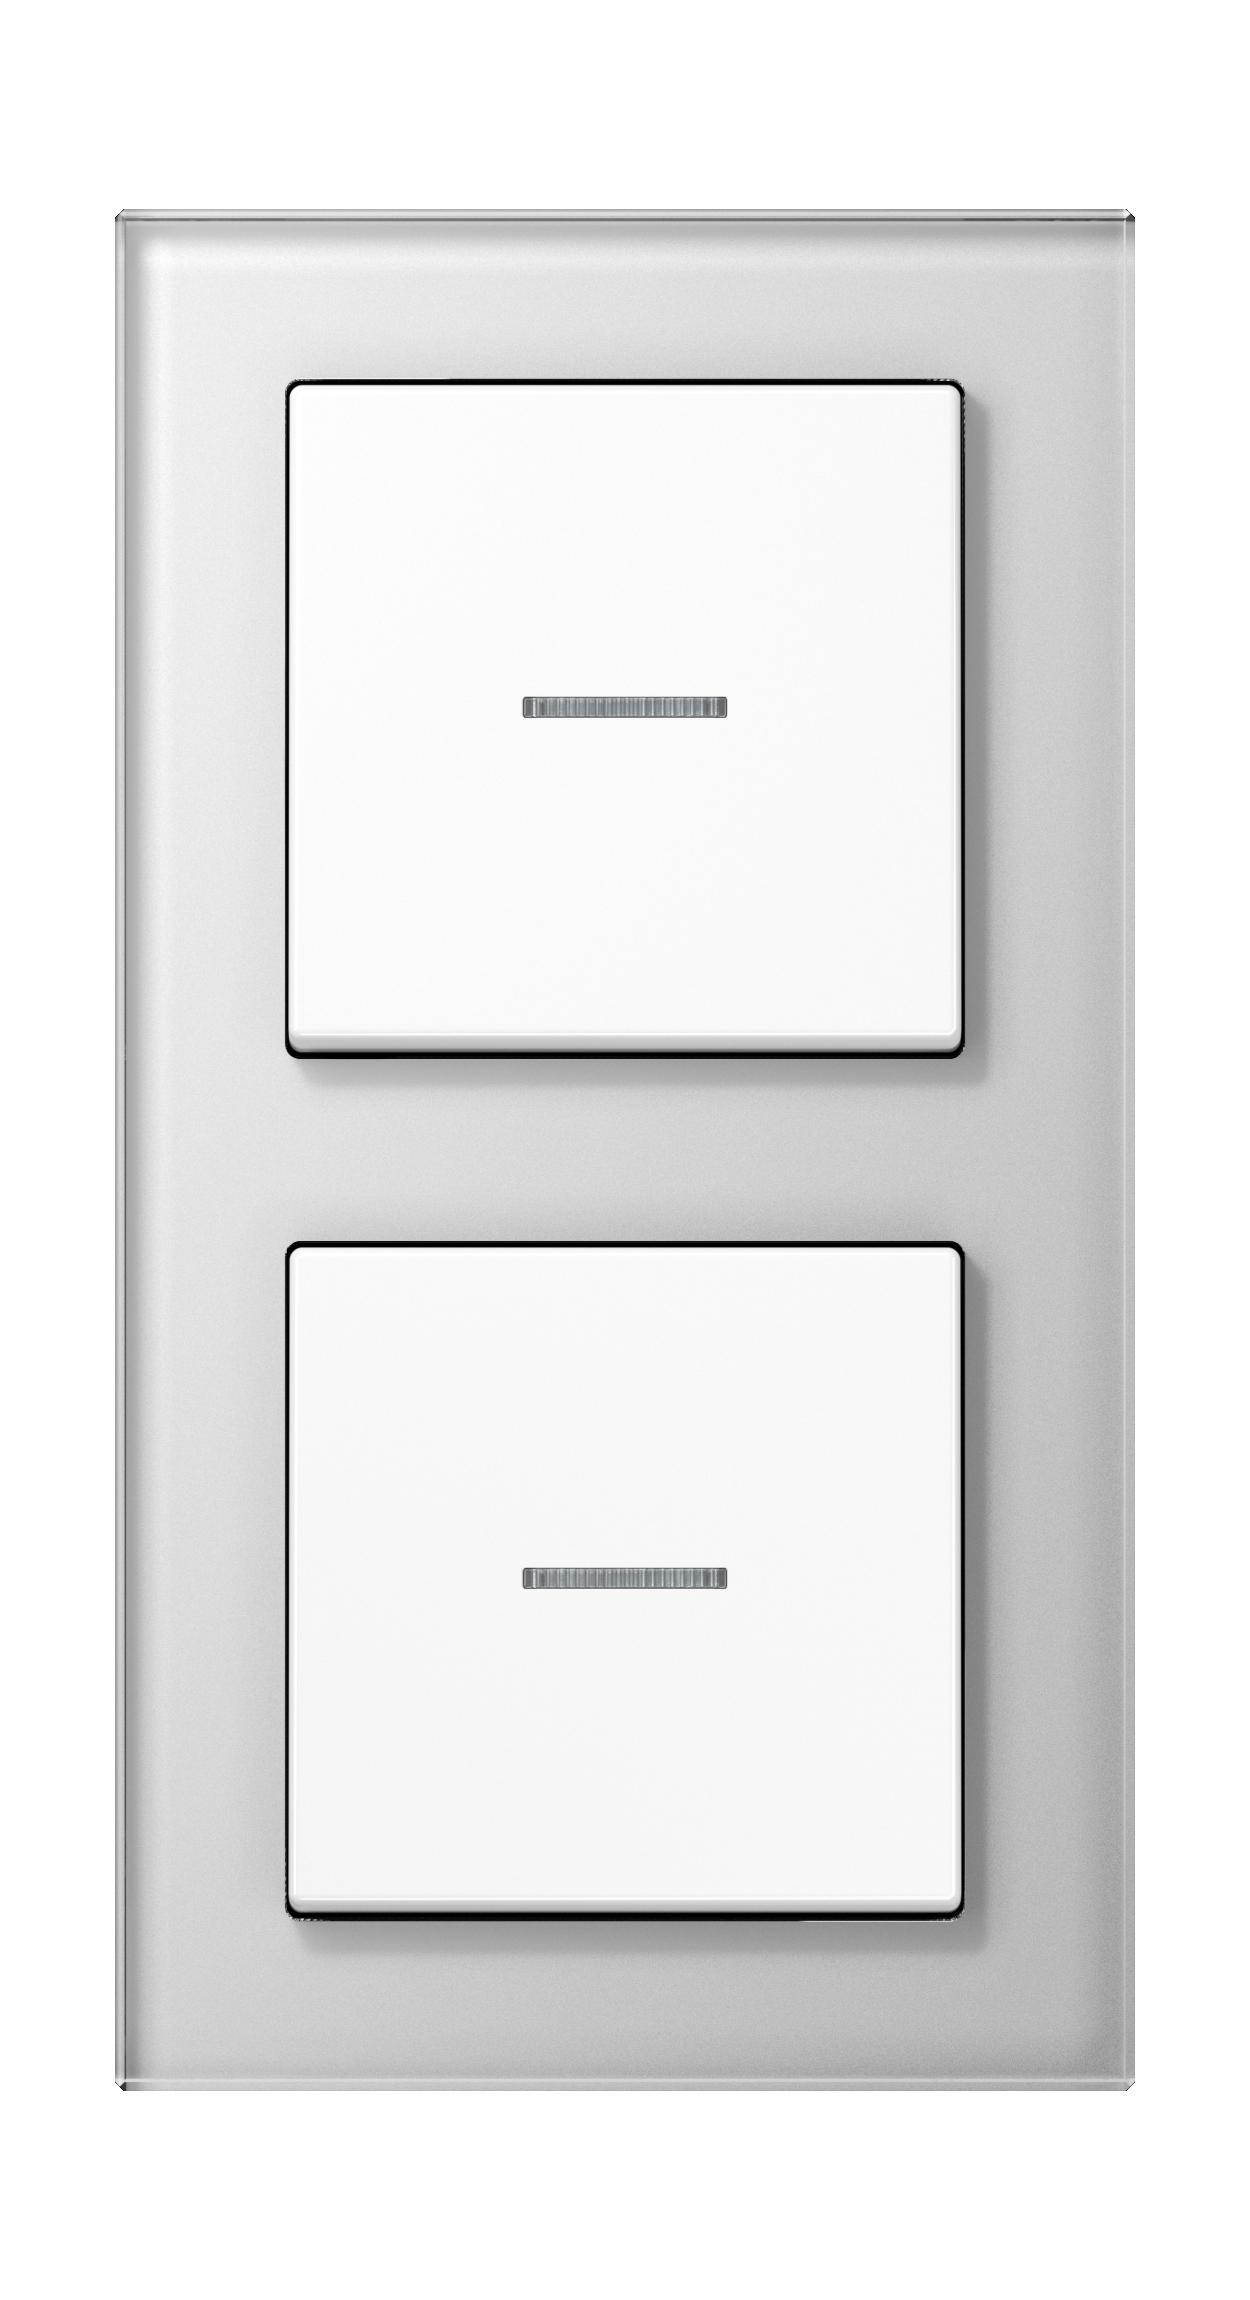 JUNG_AC_GL_white_switch-lense_switch-lense